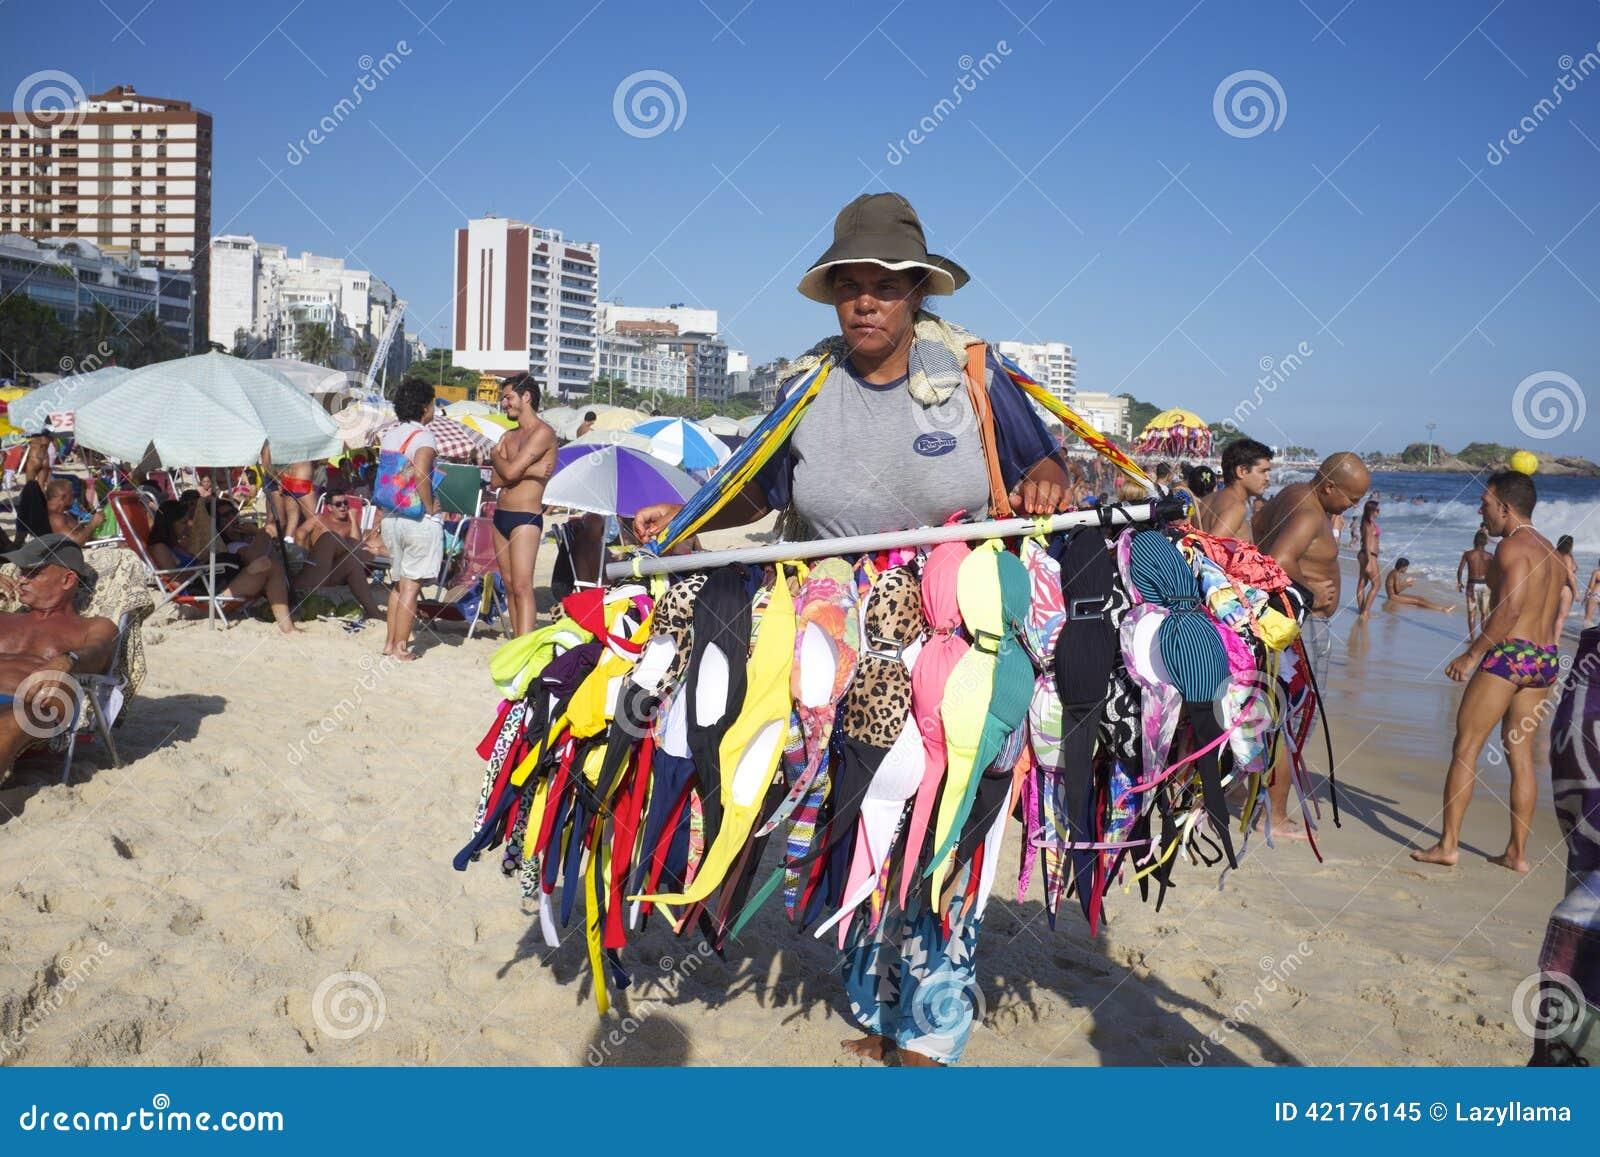 Bikini Vendor Ipanema Beach Rio de Janeiro Brazil